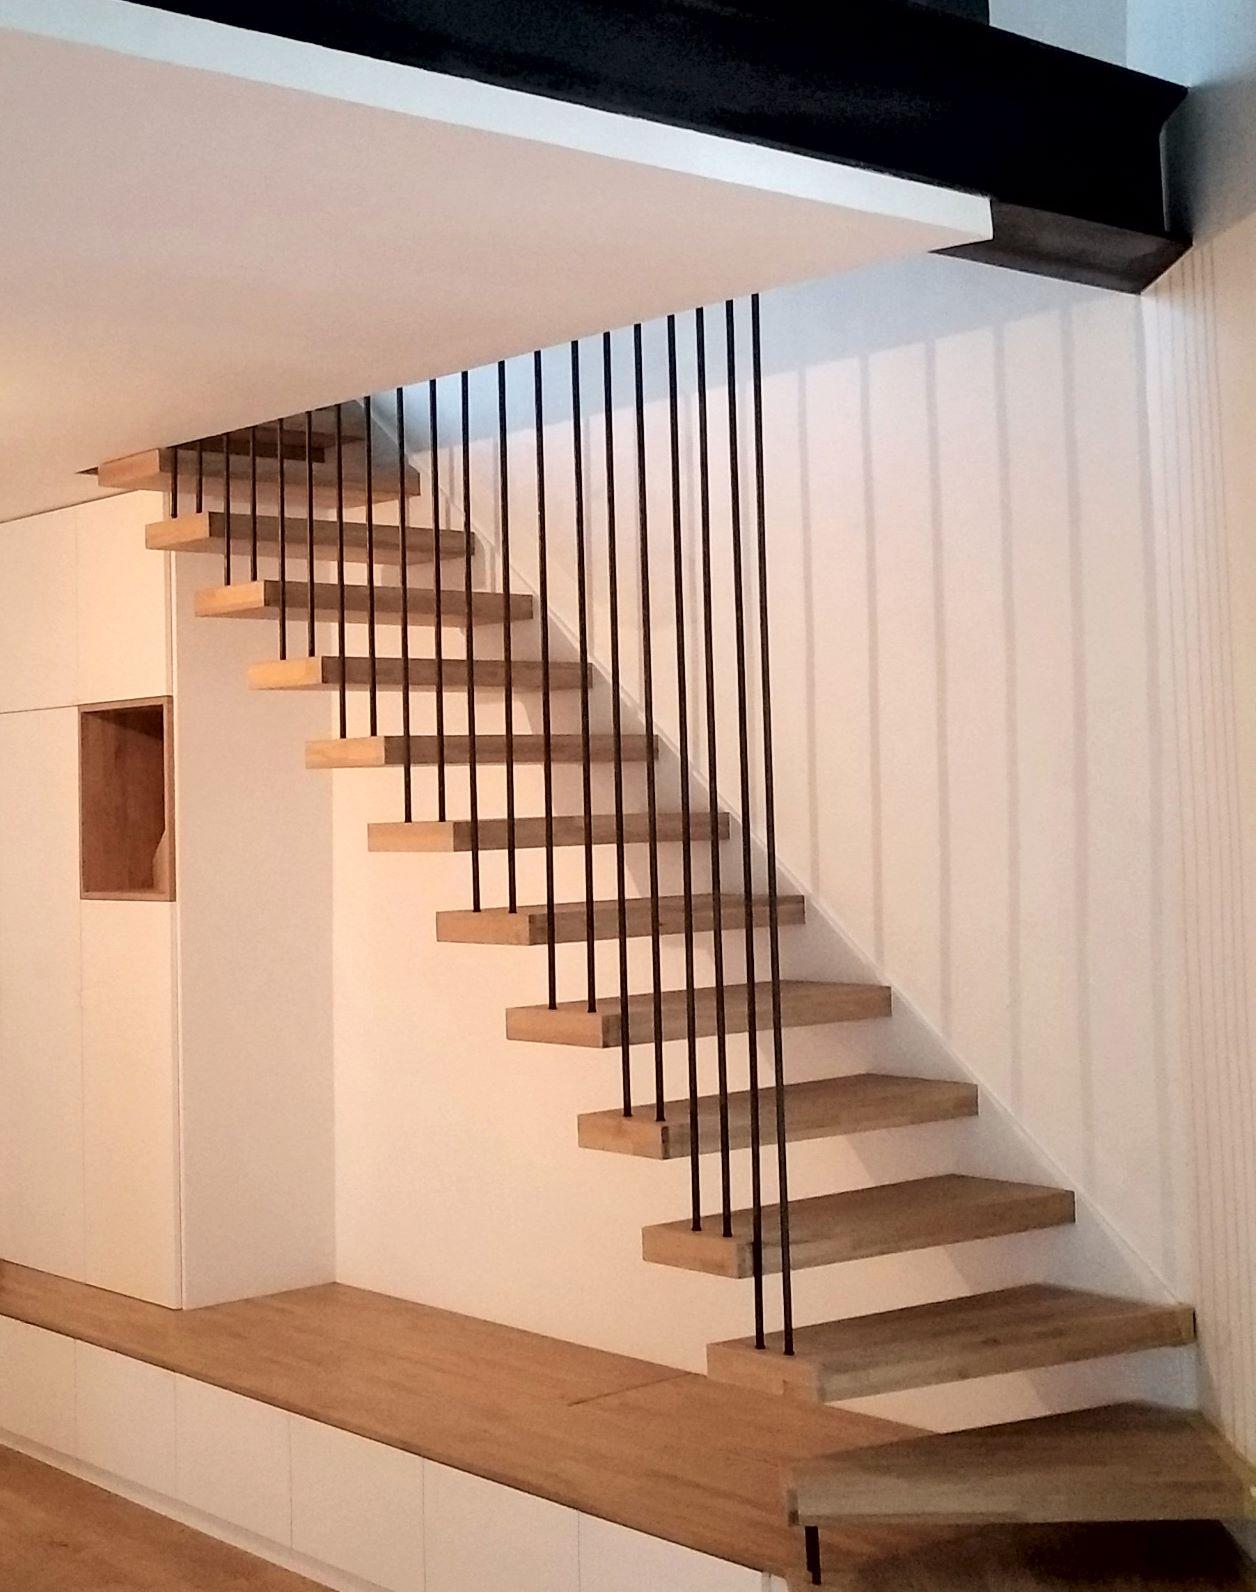 Inox-Ngo-ferronnier-Marseille-escalier-flottant-bois-métal-1r